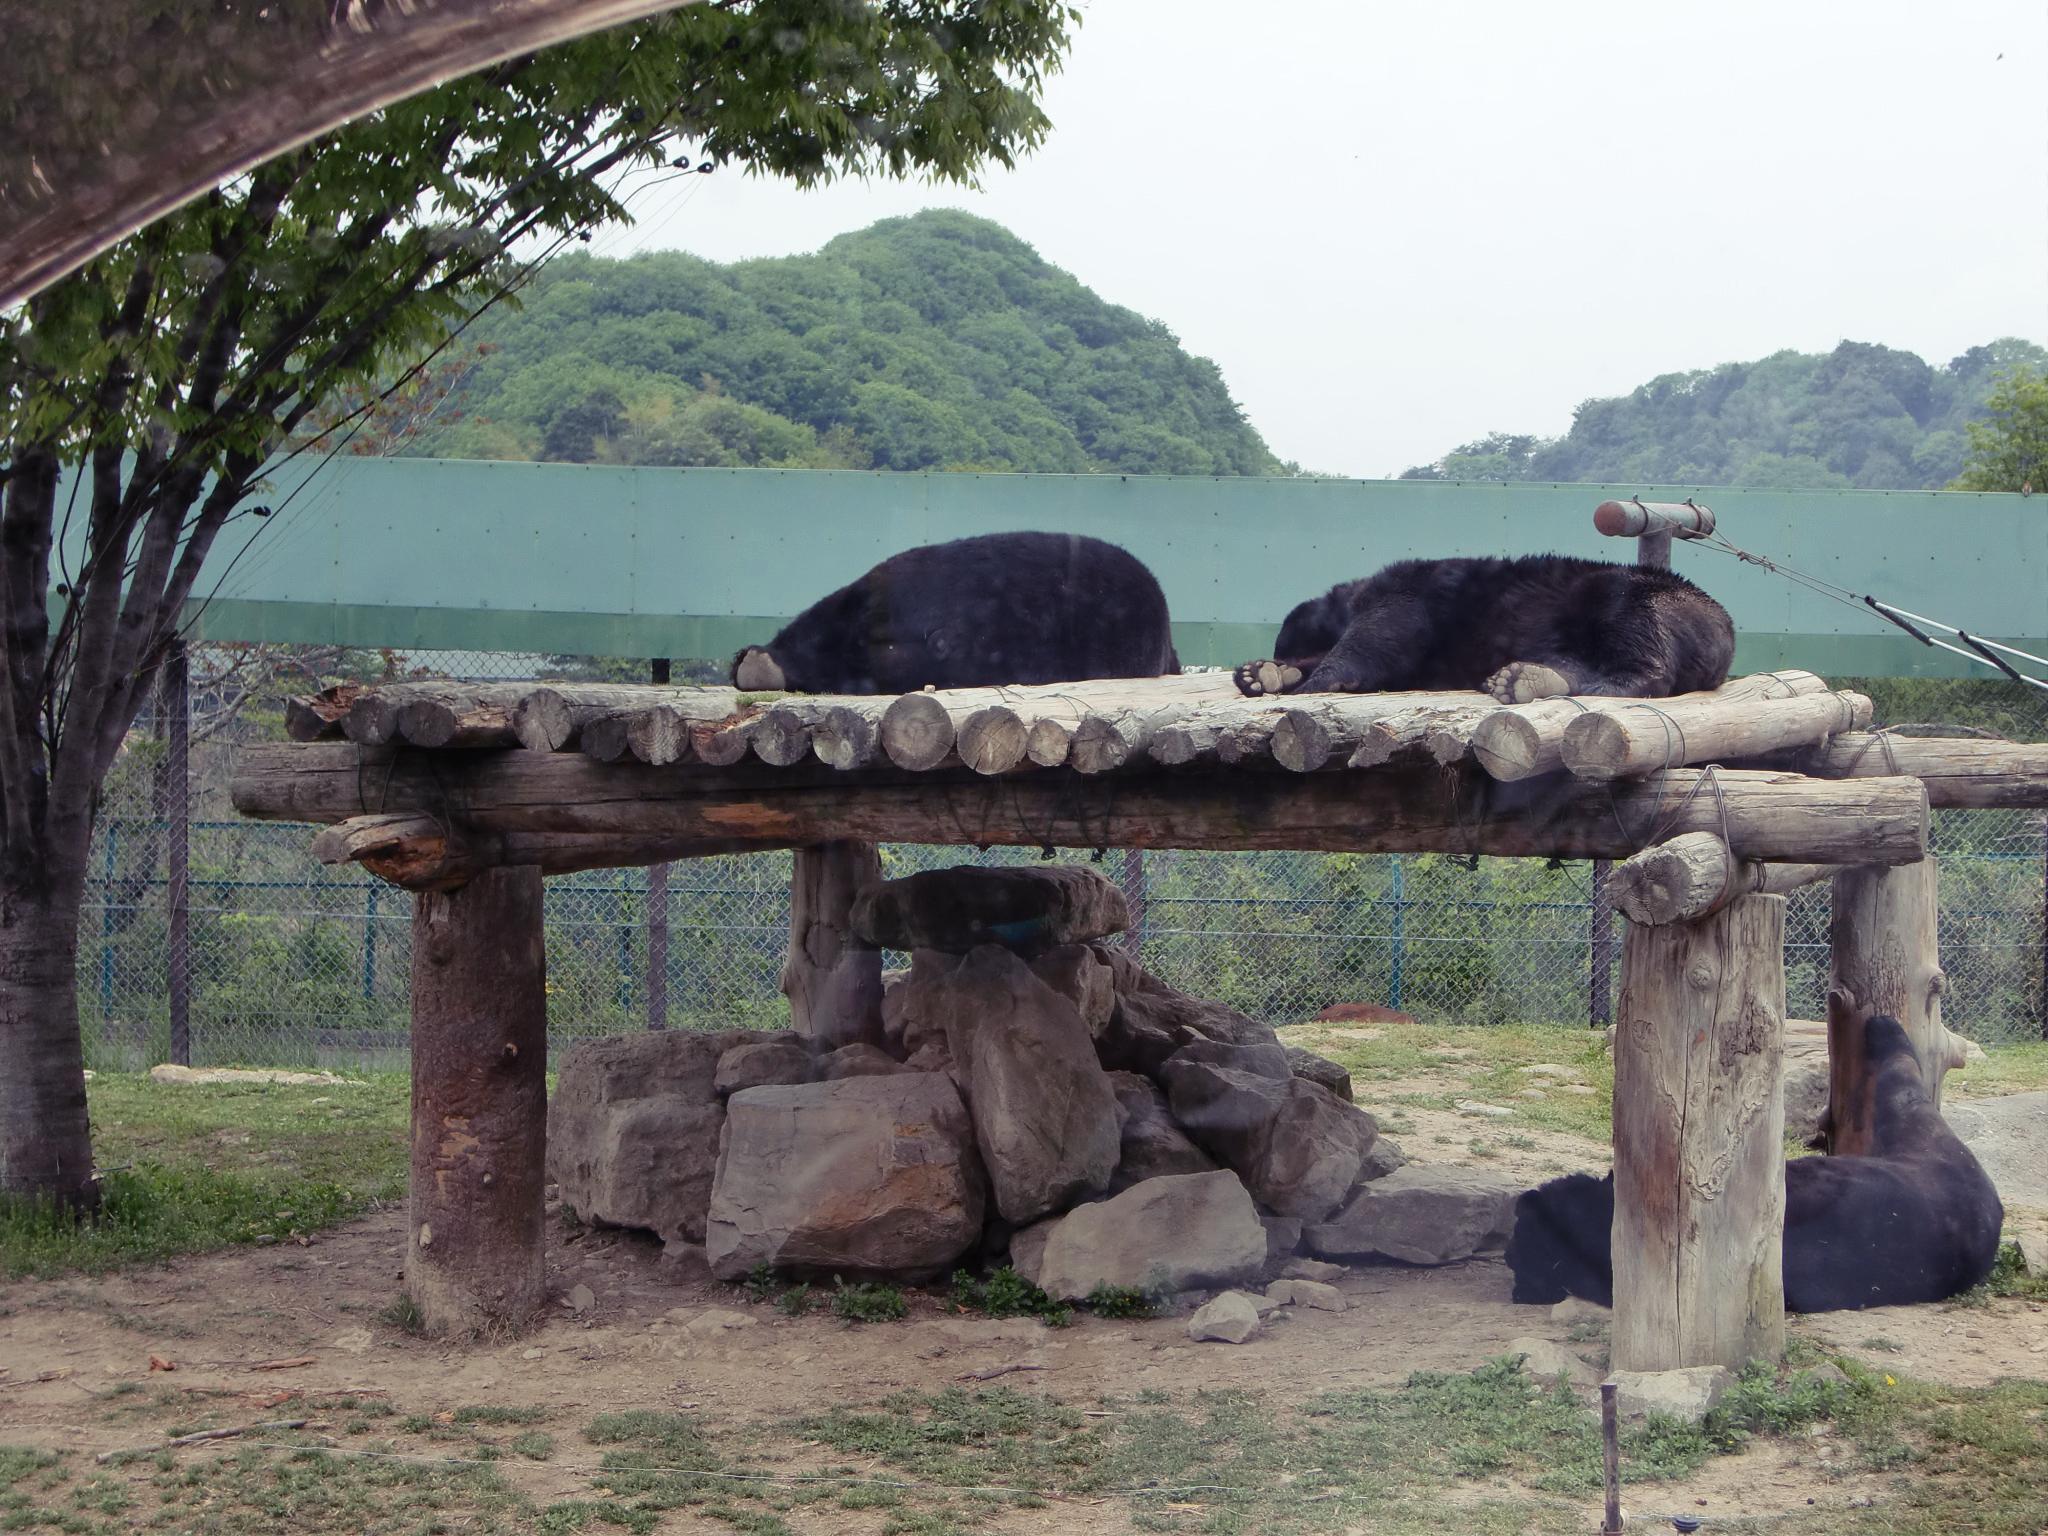 Sleeping bear, Bear, Landscape, Sleeping, Zoo, HQ Photo